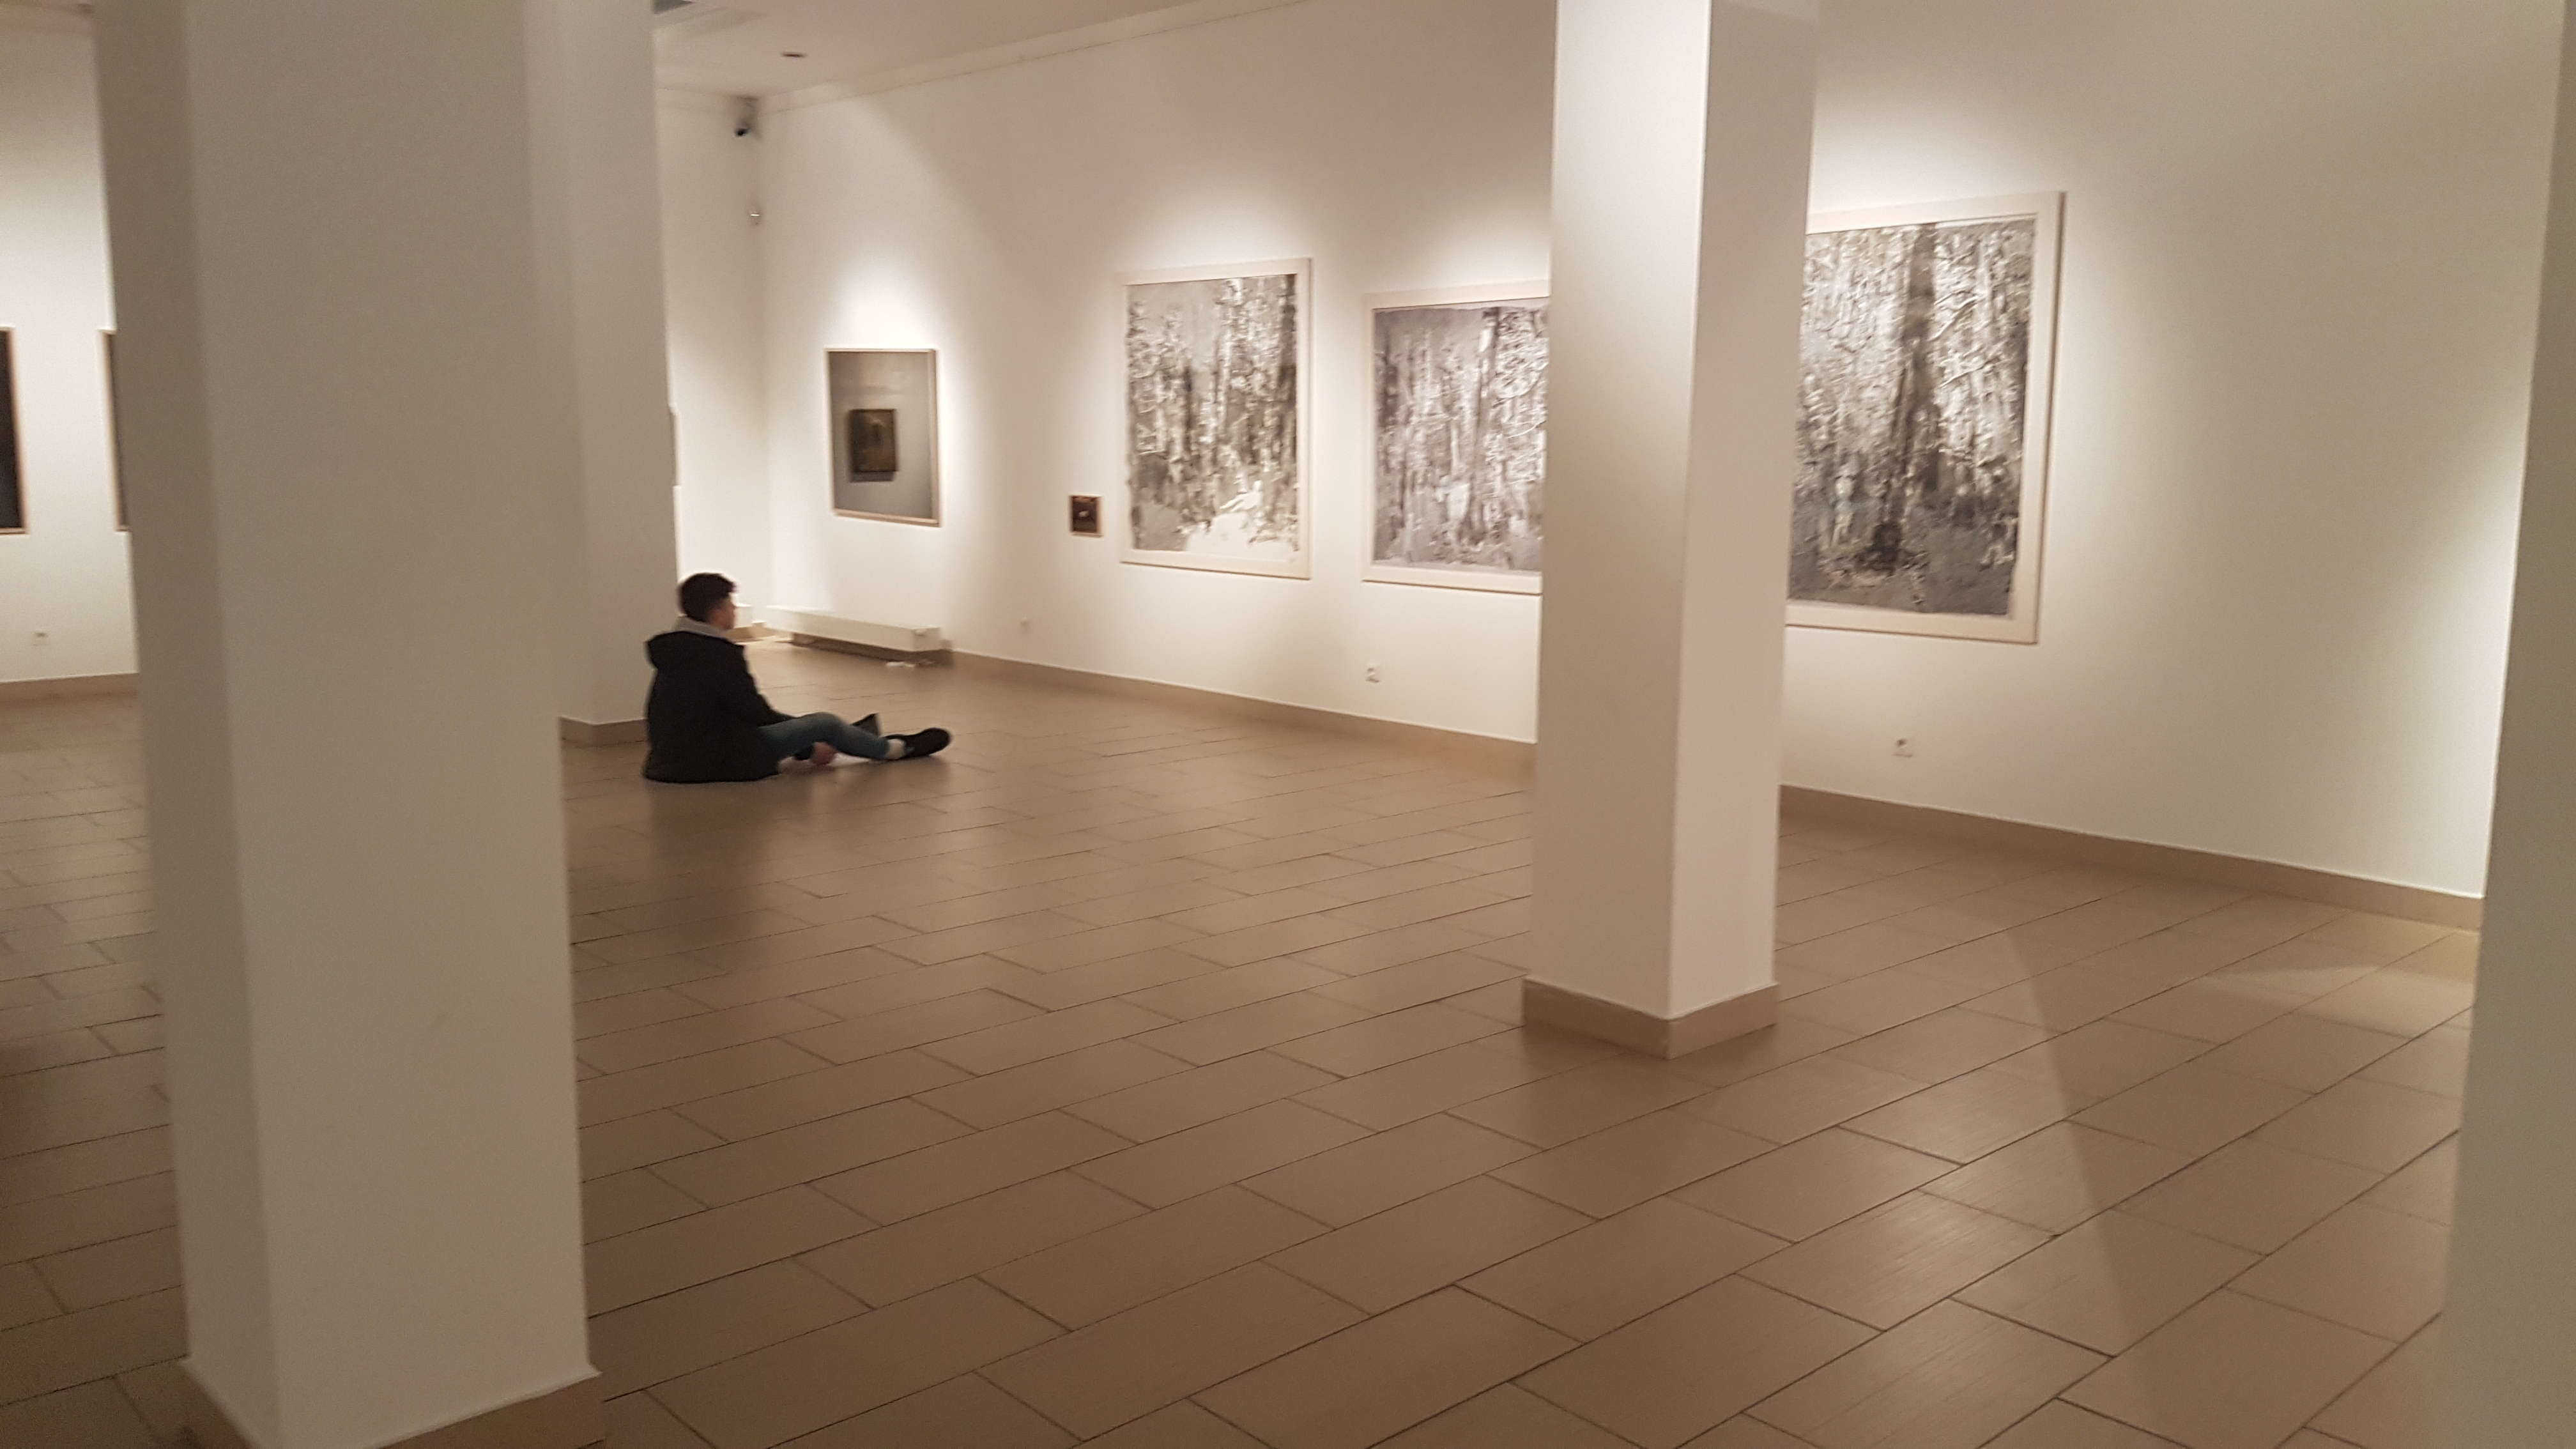 Eglės Vertelkaitės paroda MOIROS Vilniuje. TITANIKE